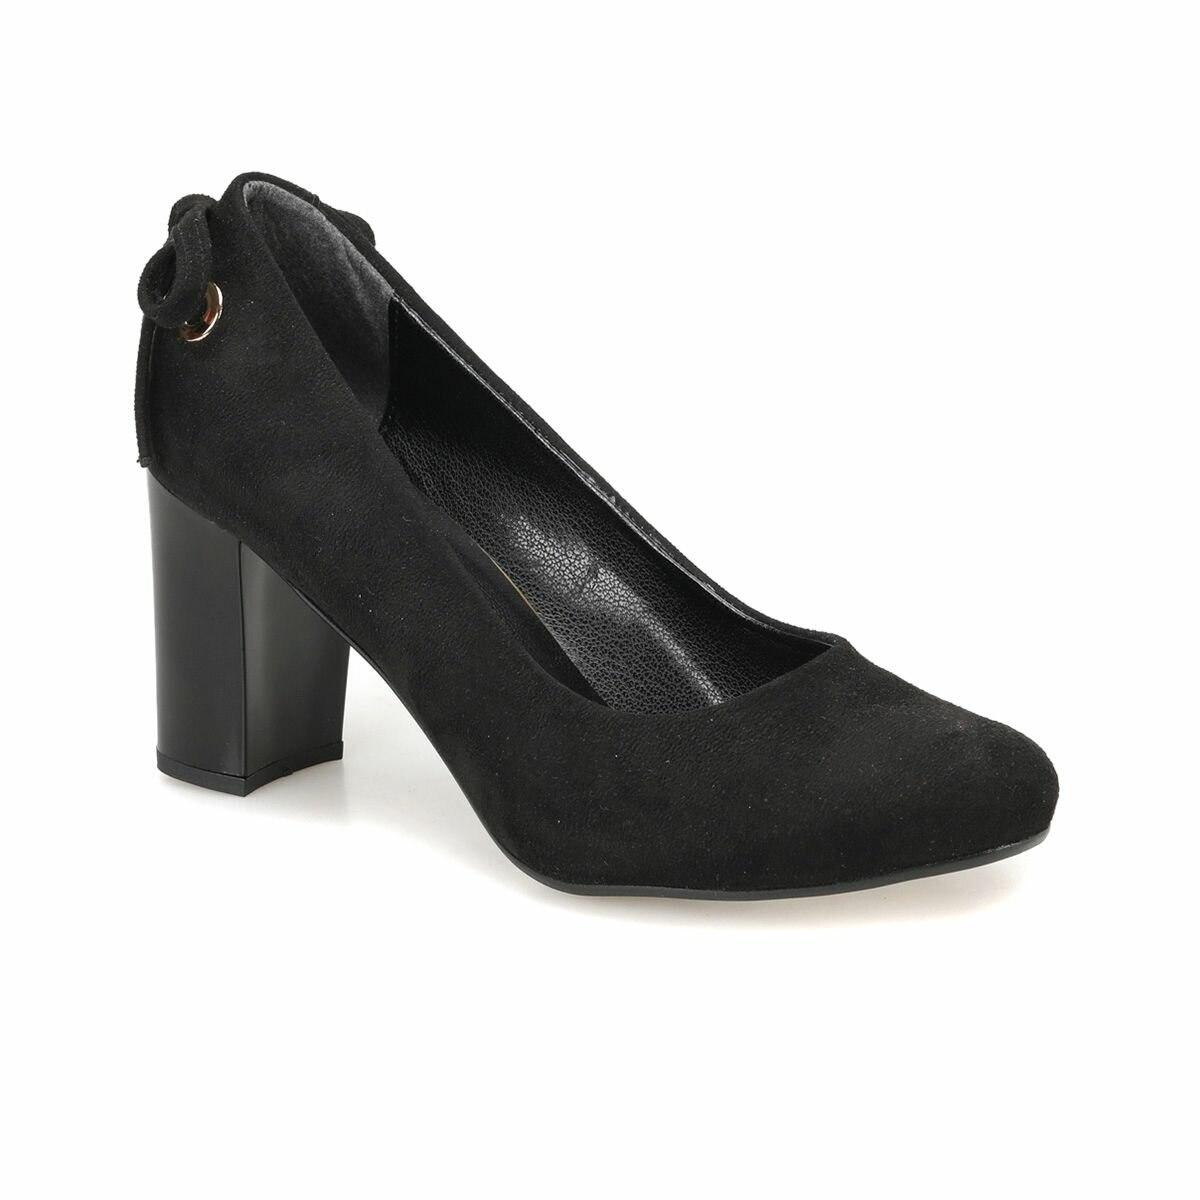 FLO DW18030 Black Women Gova Shoes Miss F